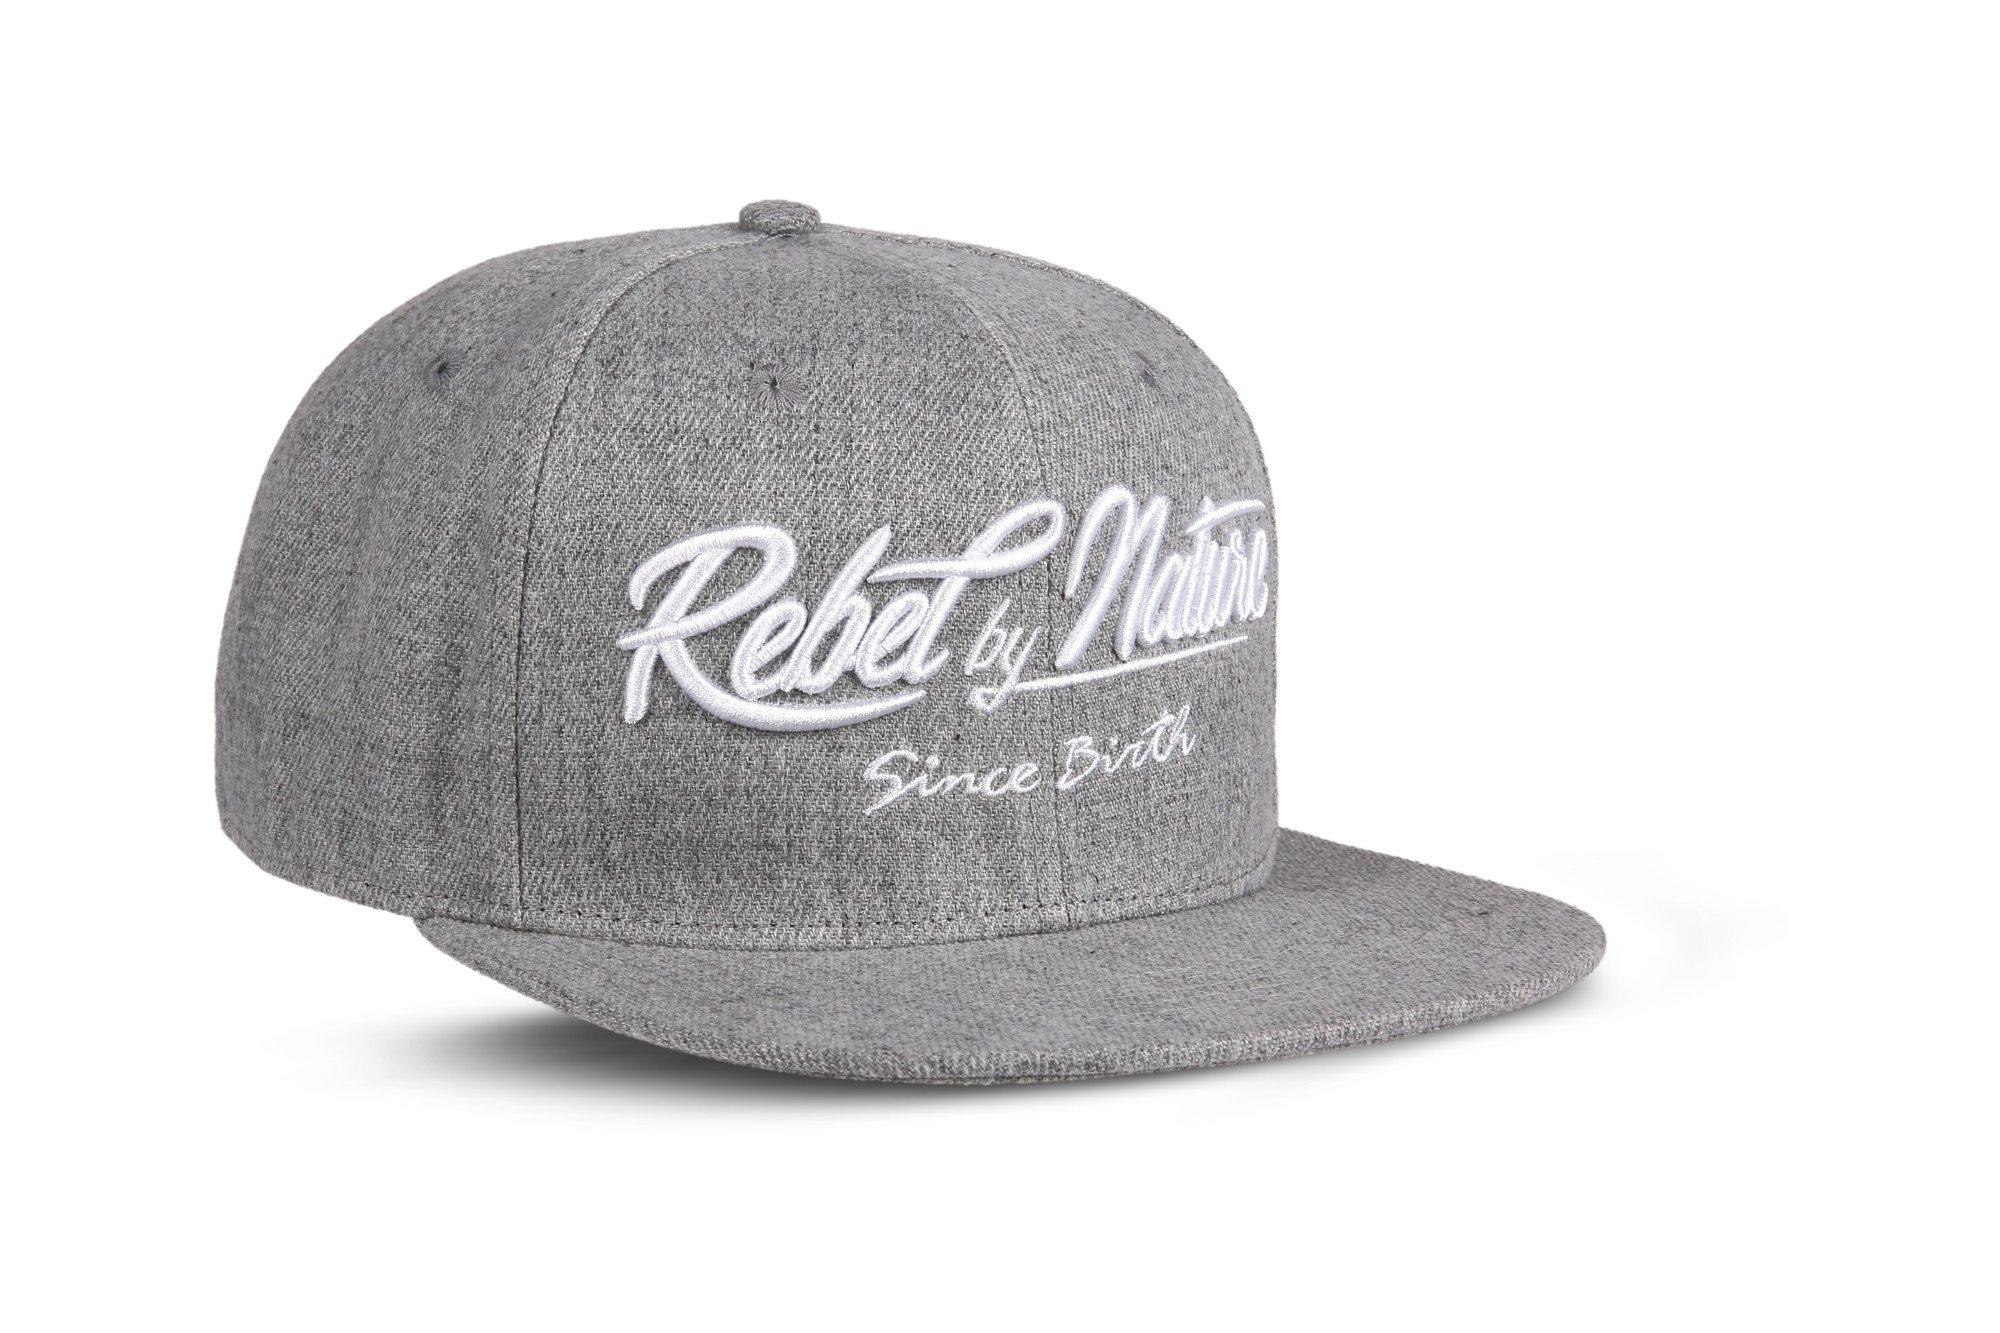 c94777311a262 Rebel by Nature RC2 – Snapback Cap Font Cap Unisex Cap Sports Baseball 100%  Acrylic – Collection No1-6Panel Original Rebel